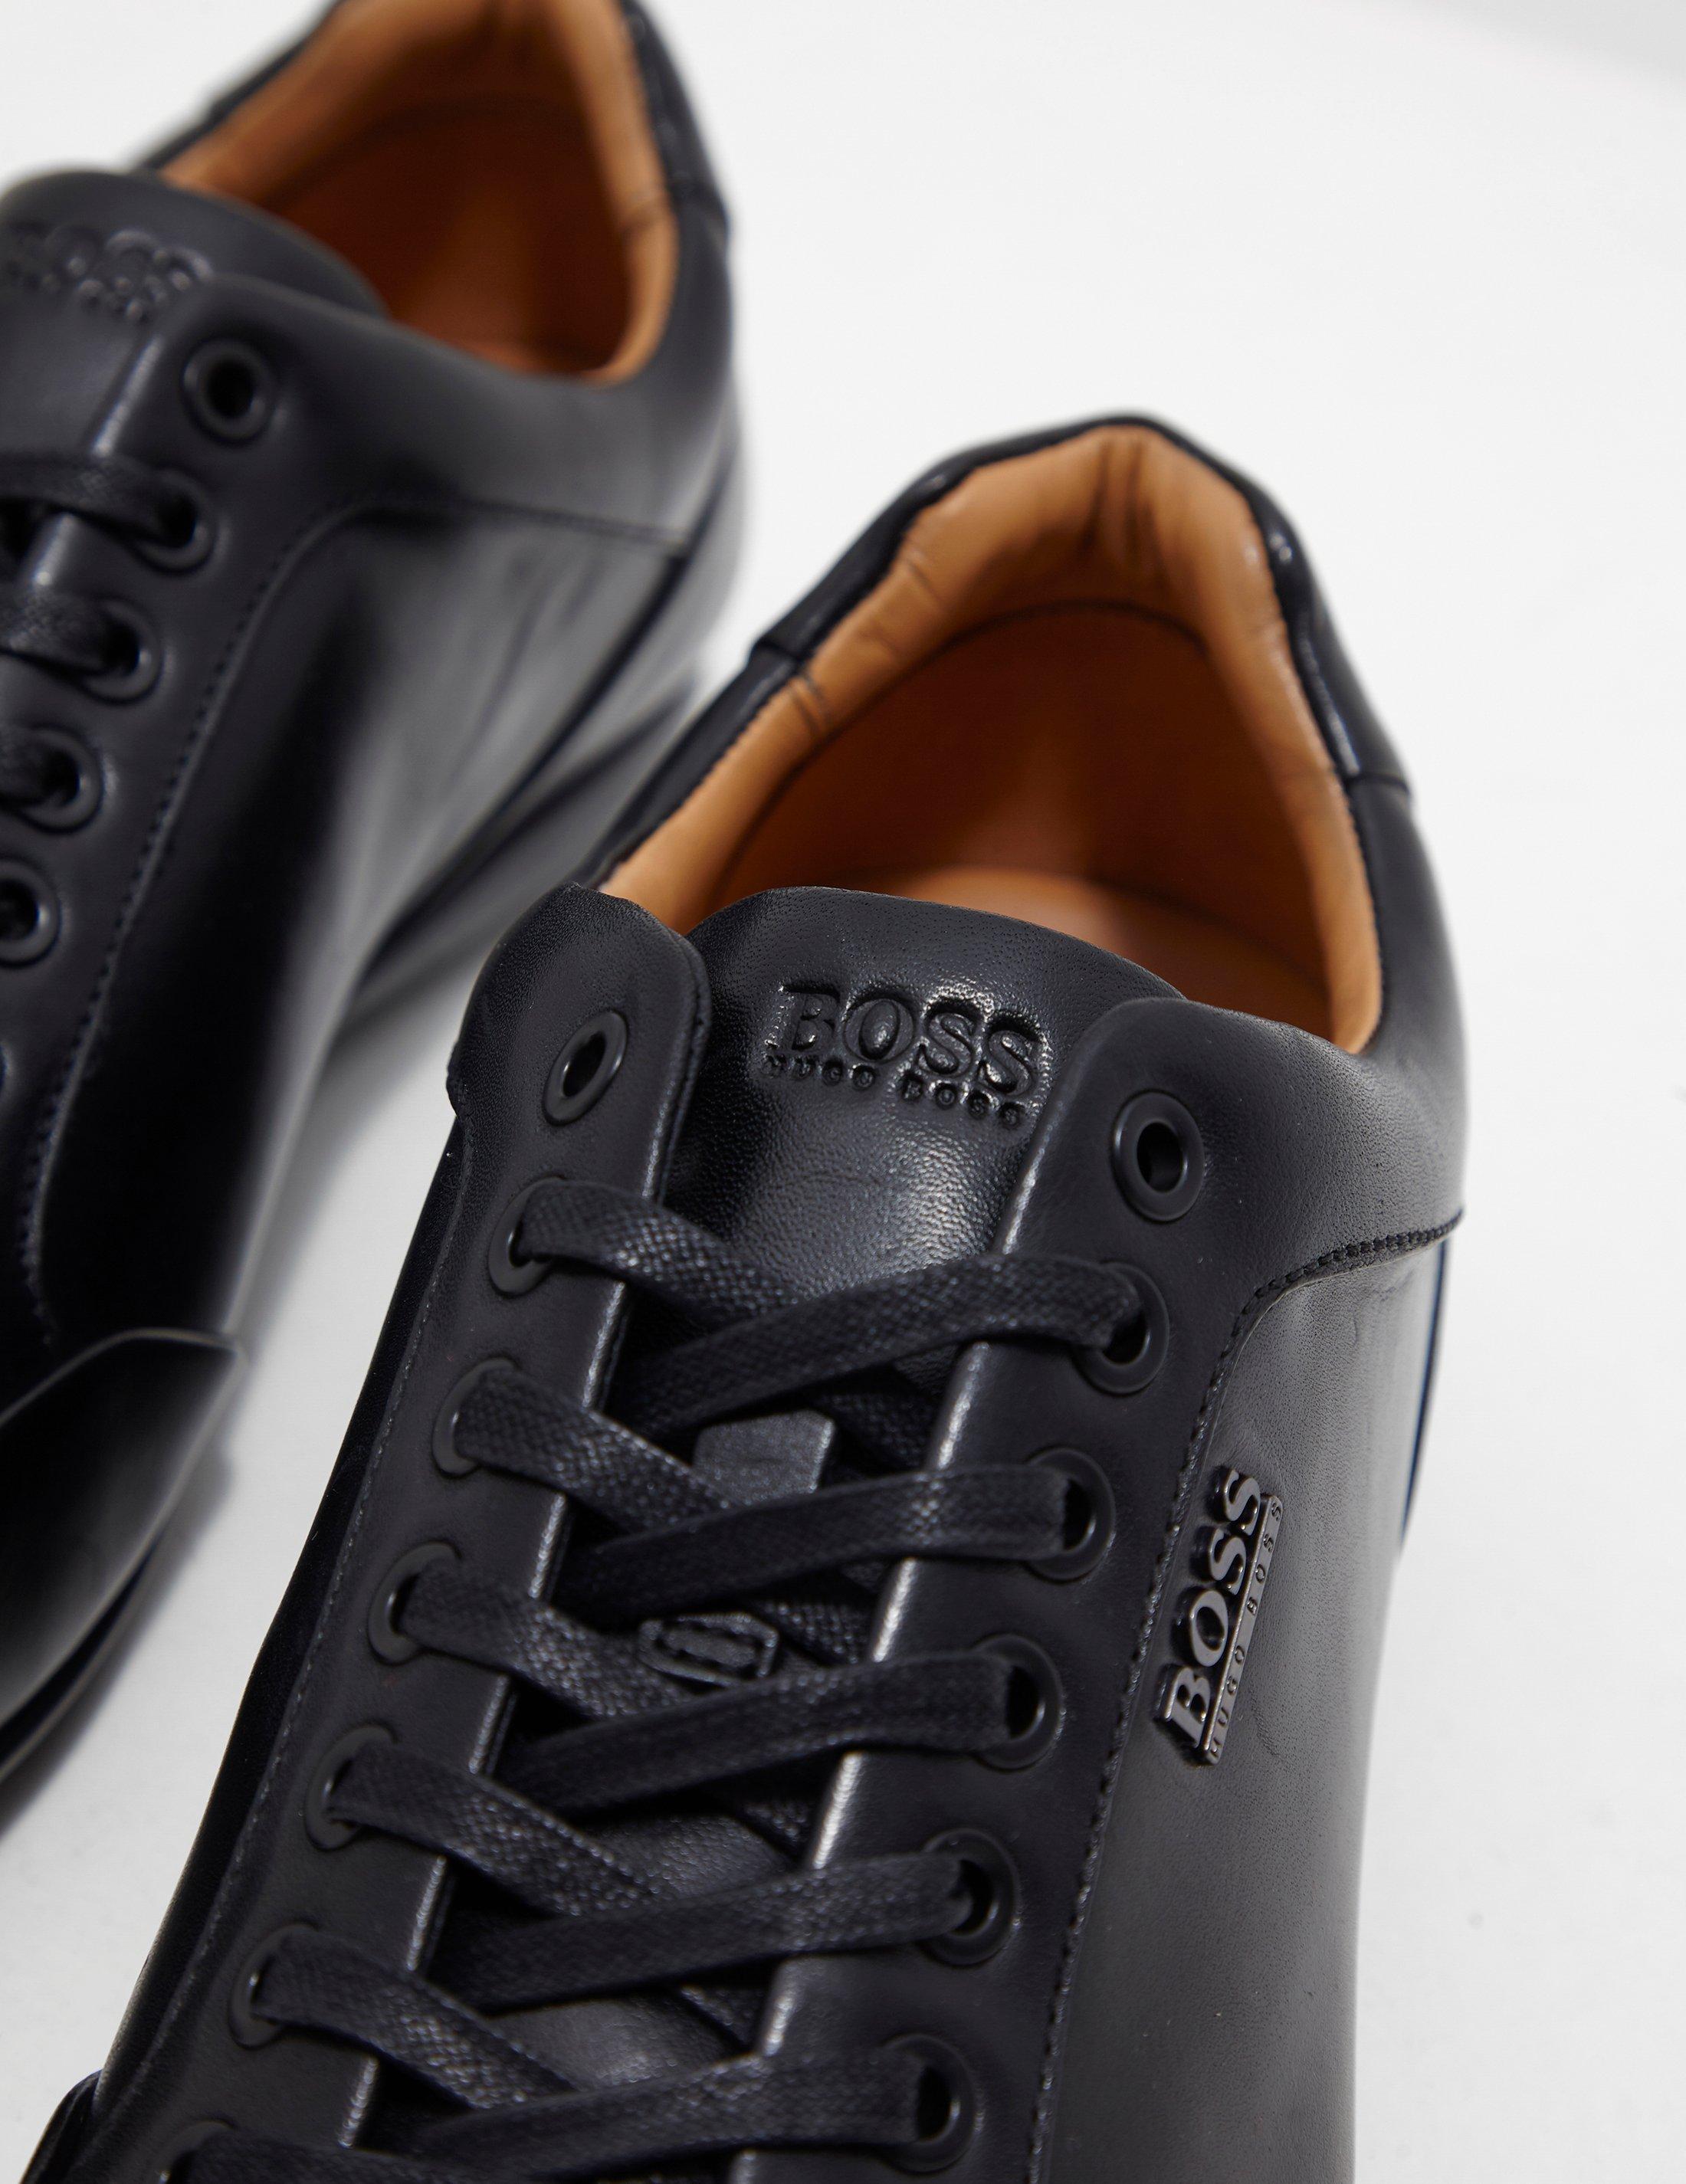 BOSS by Hugo Boss Primacy Leather Black